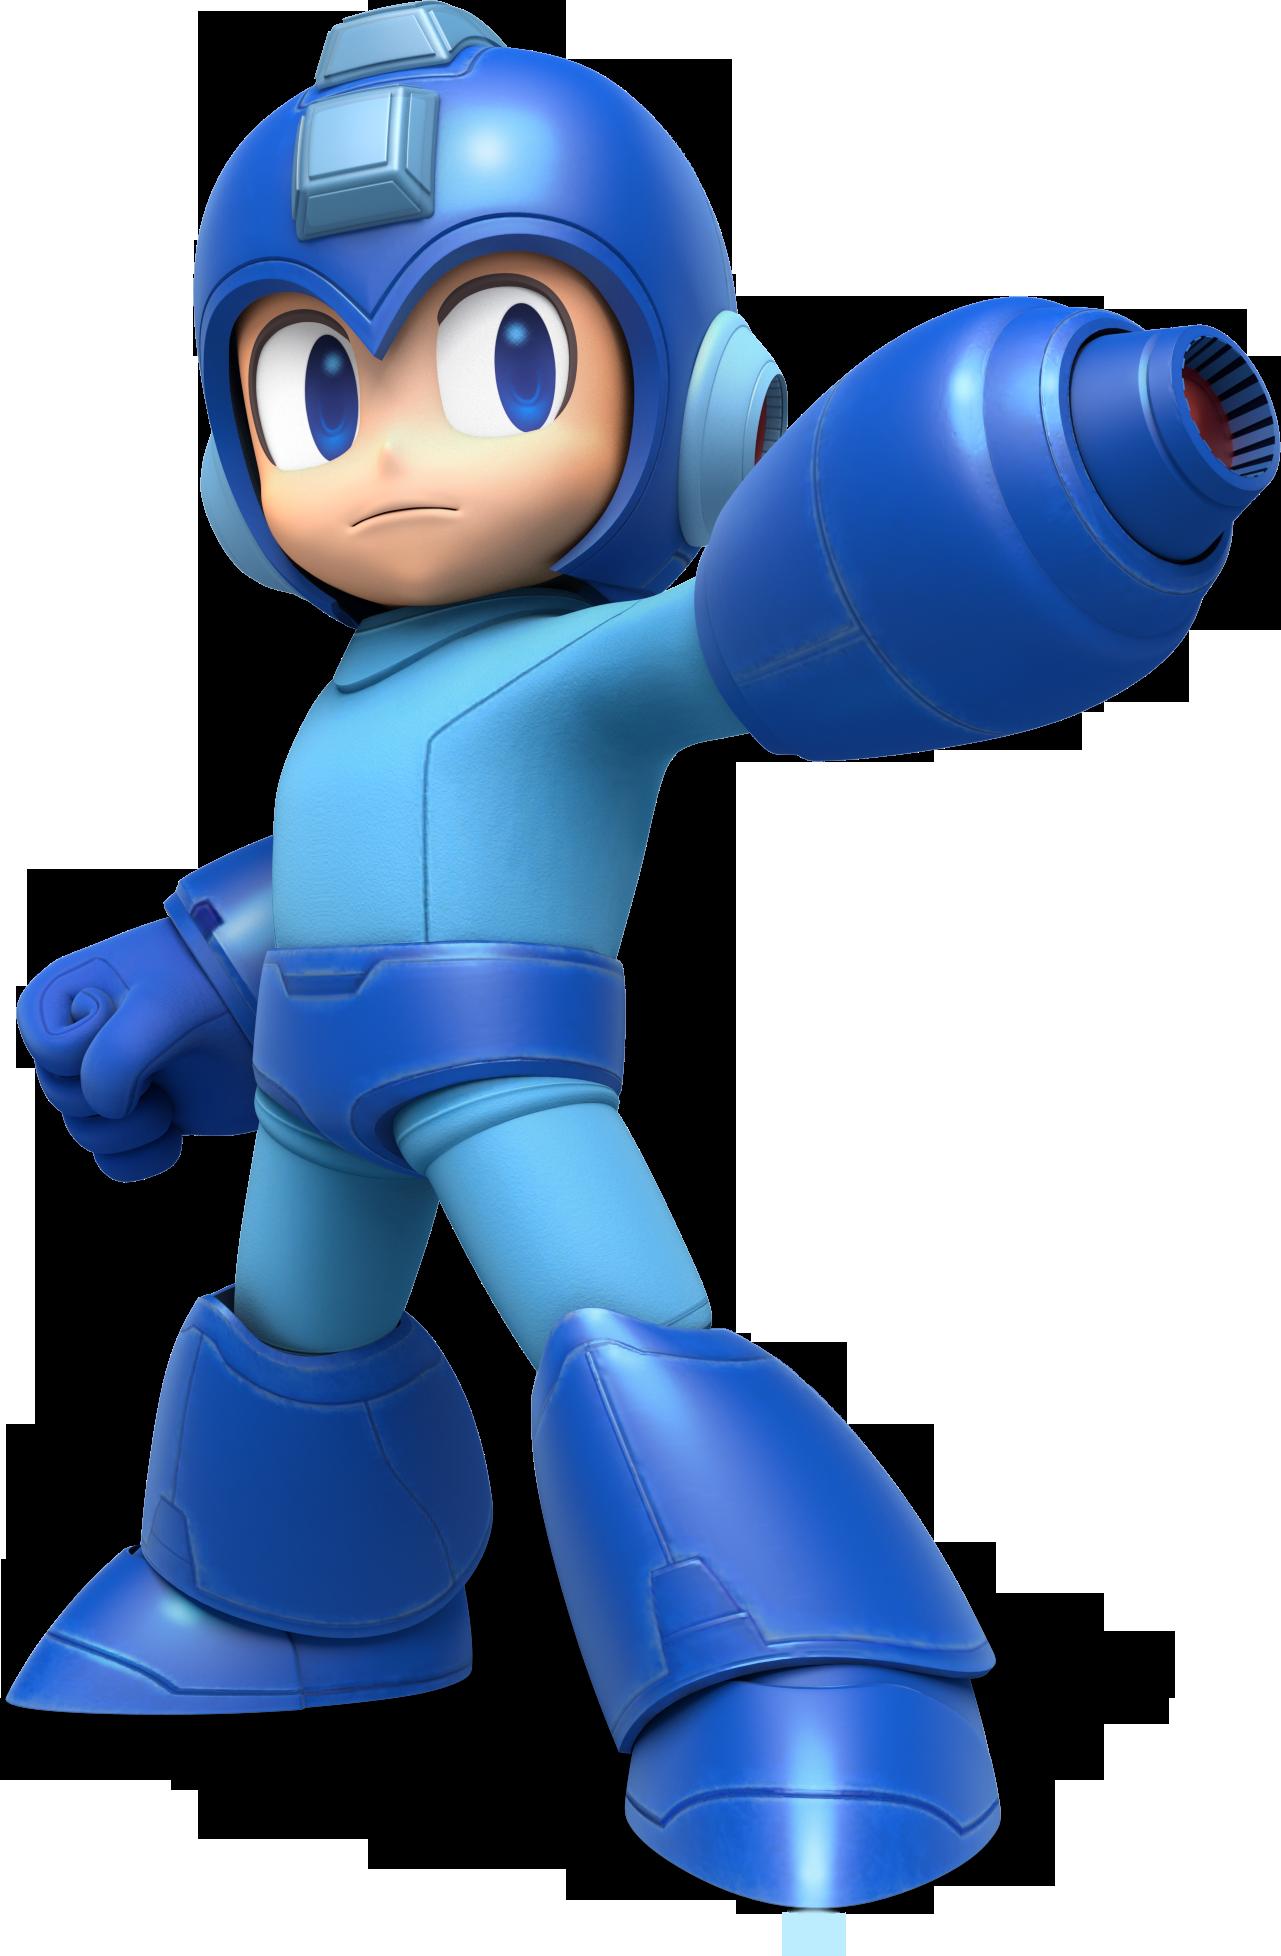 mega man character character profile wikia fandom powered by wikia